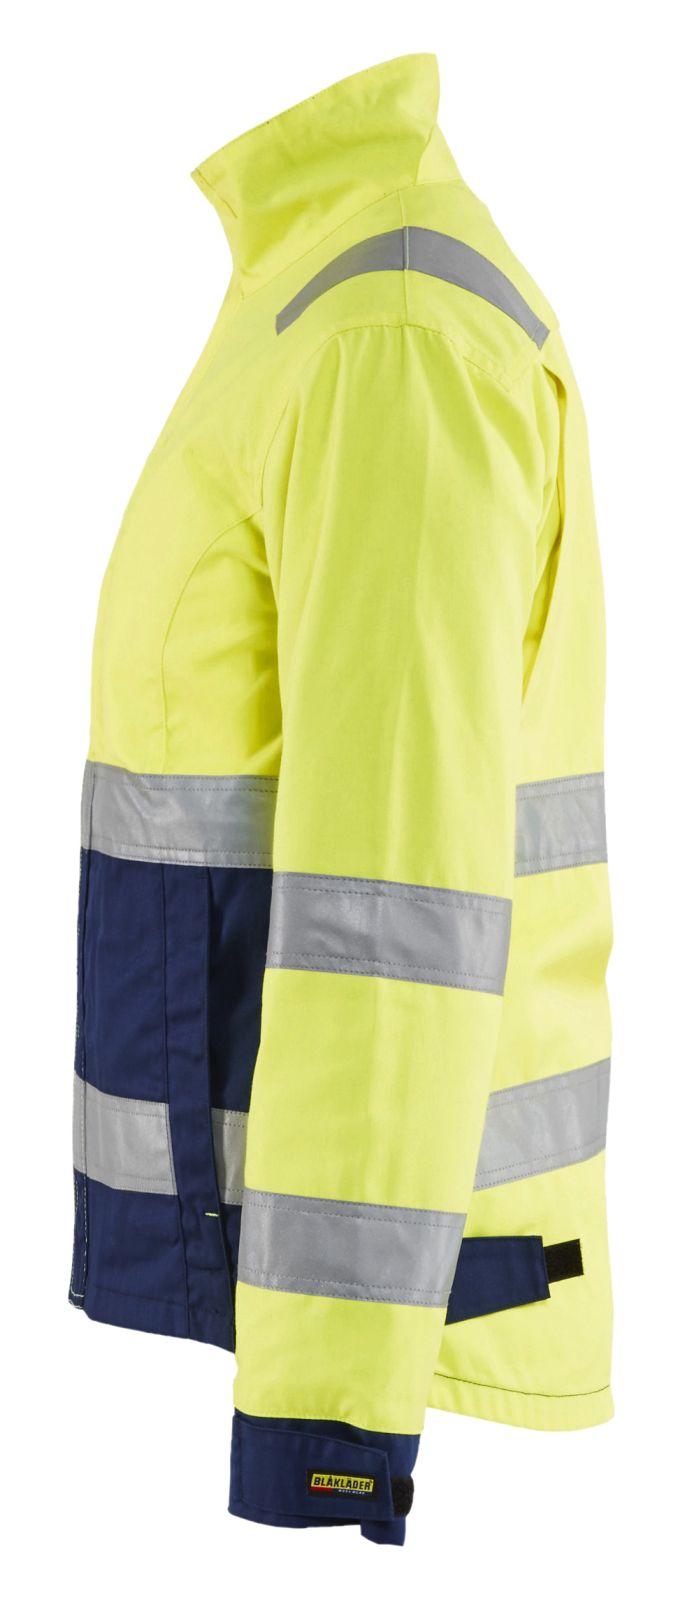 Blaklader Dames werkjacks 49031811 High Vis geel-marineblauw(3389)